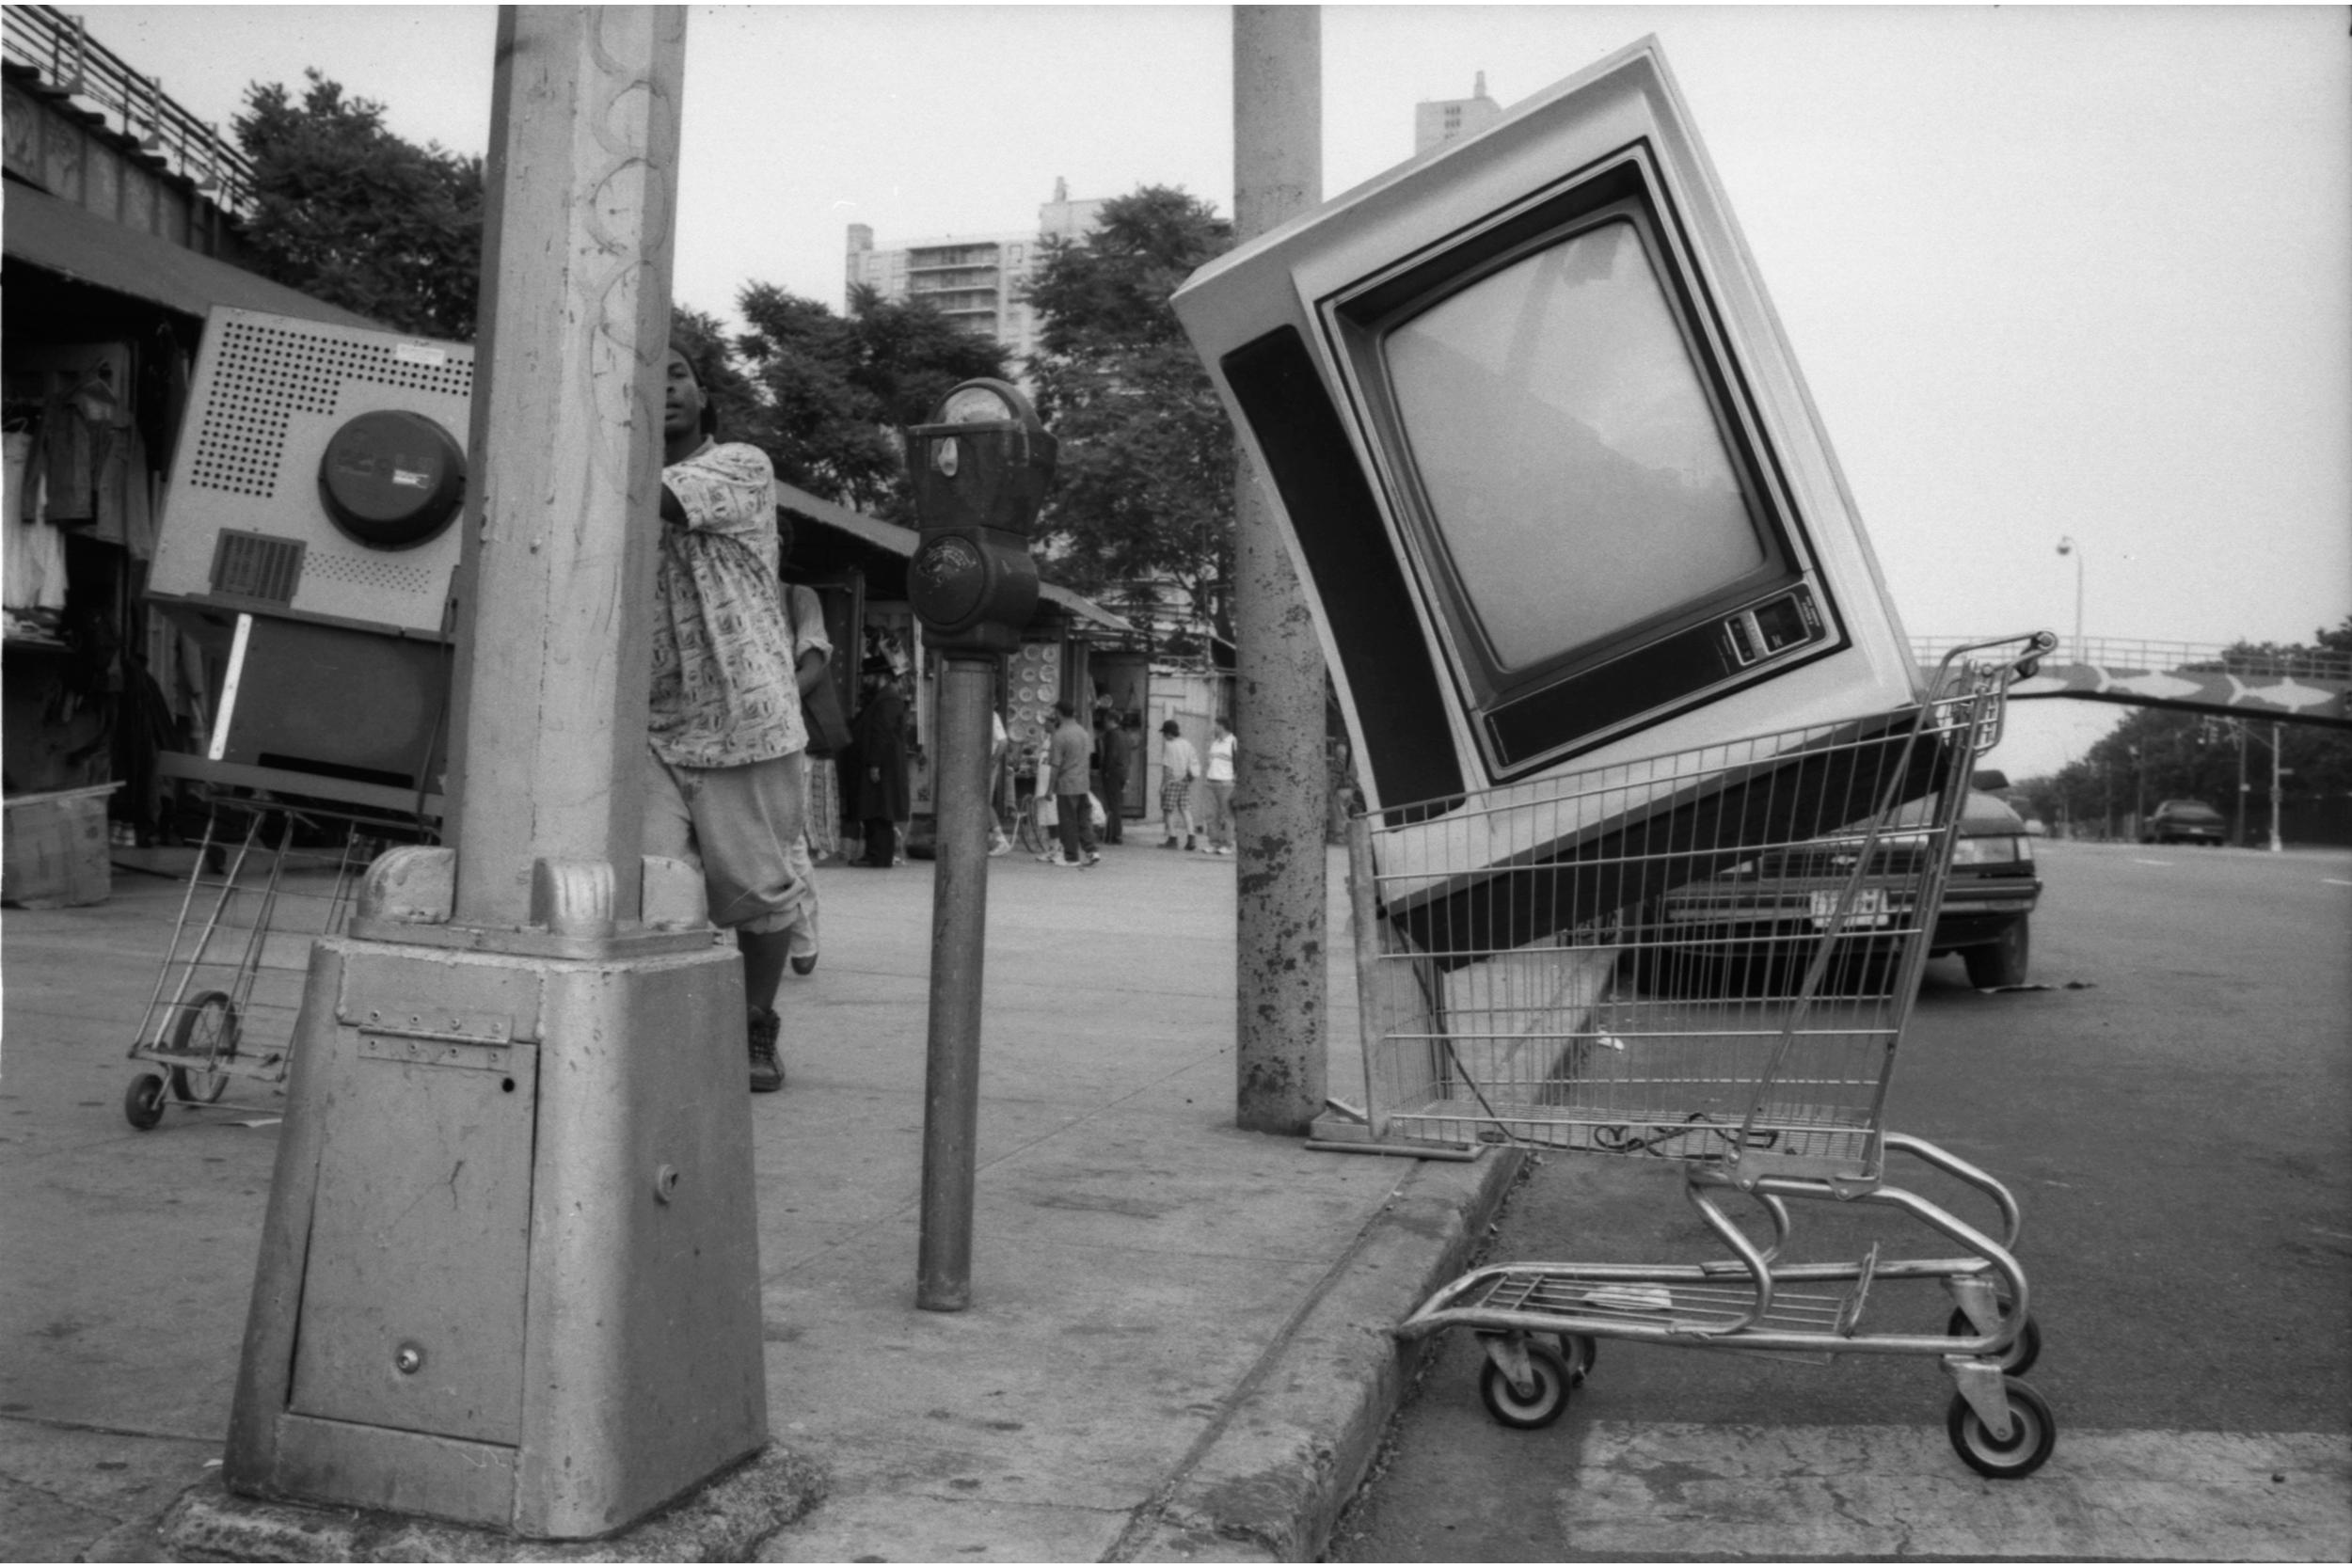 Coney Island, 1999